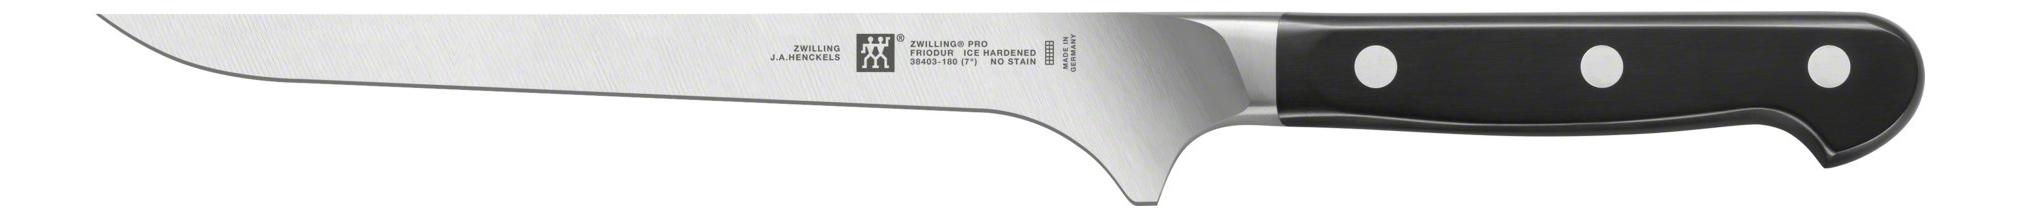 Нож кухонный Zwilling 38403 181 18 см